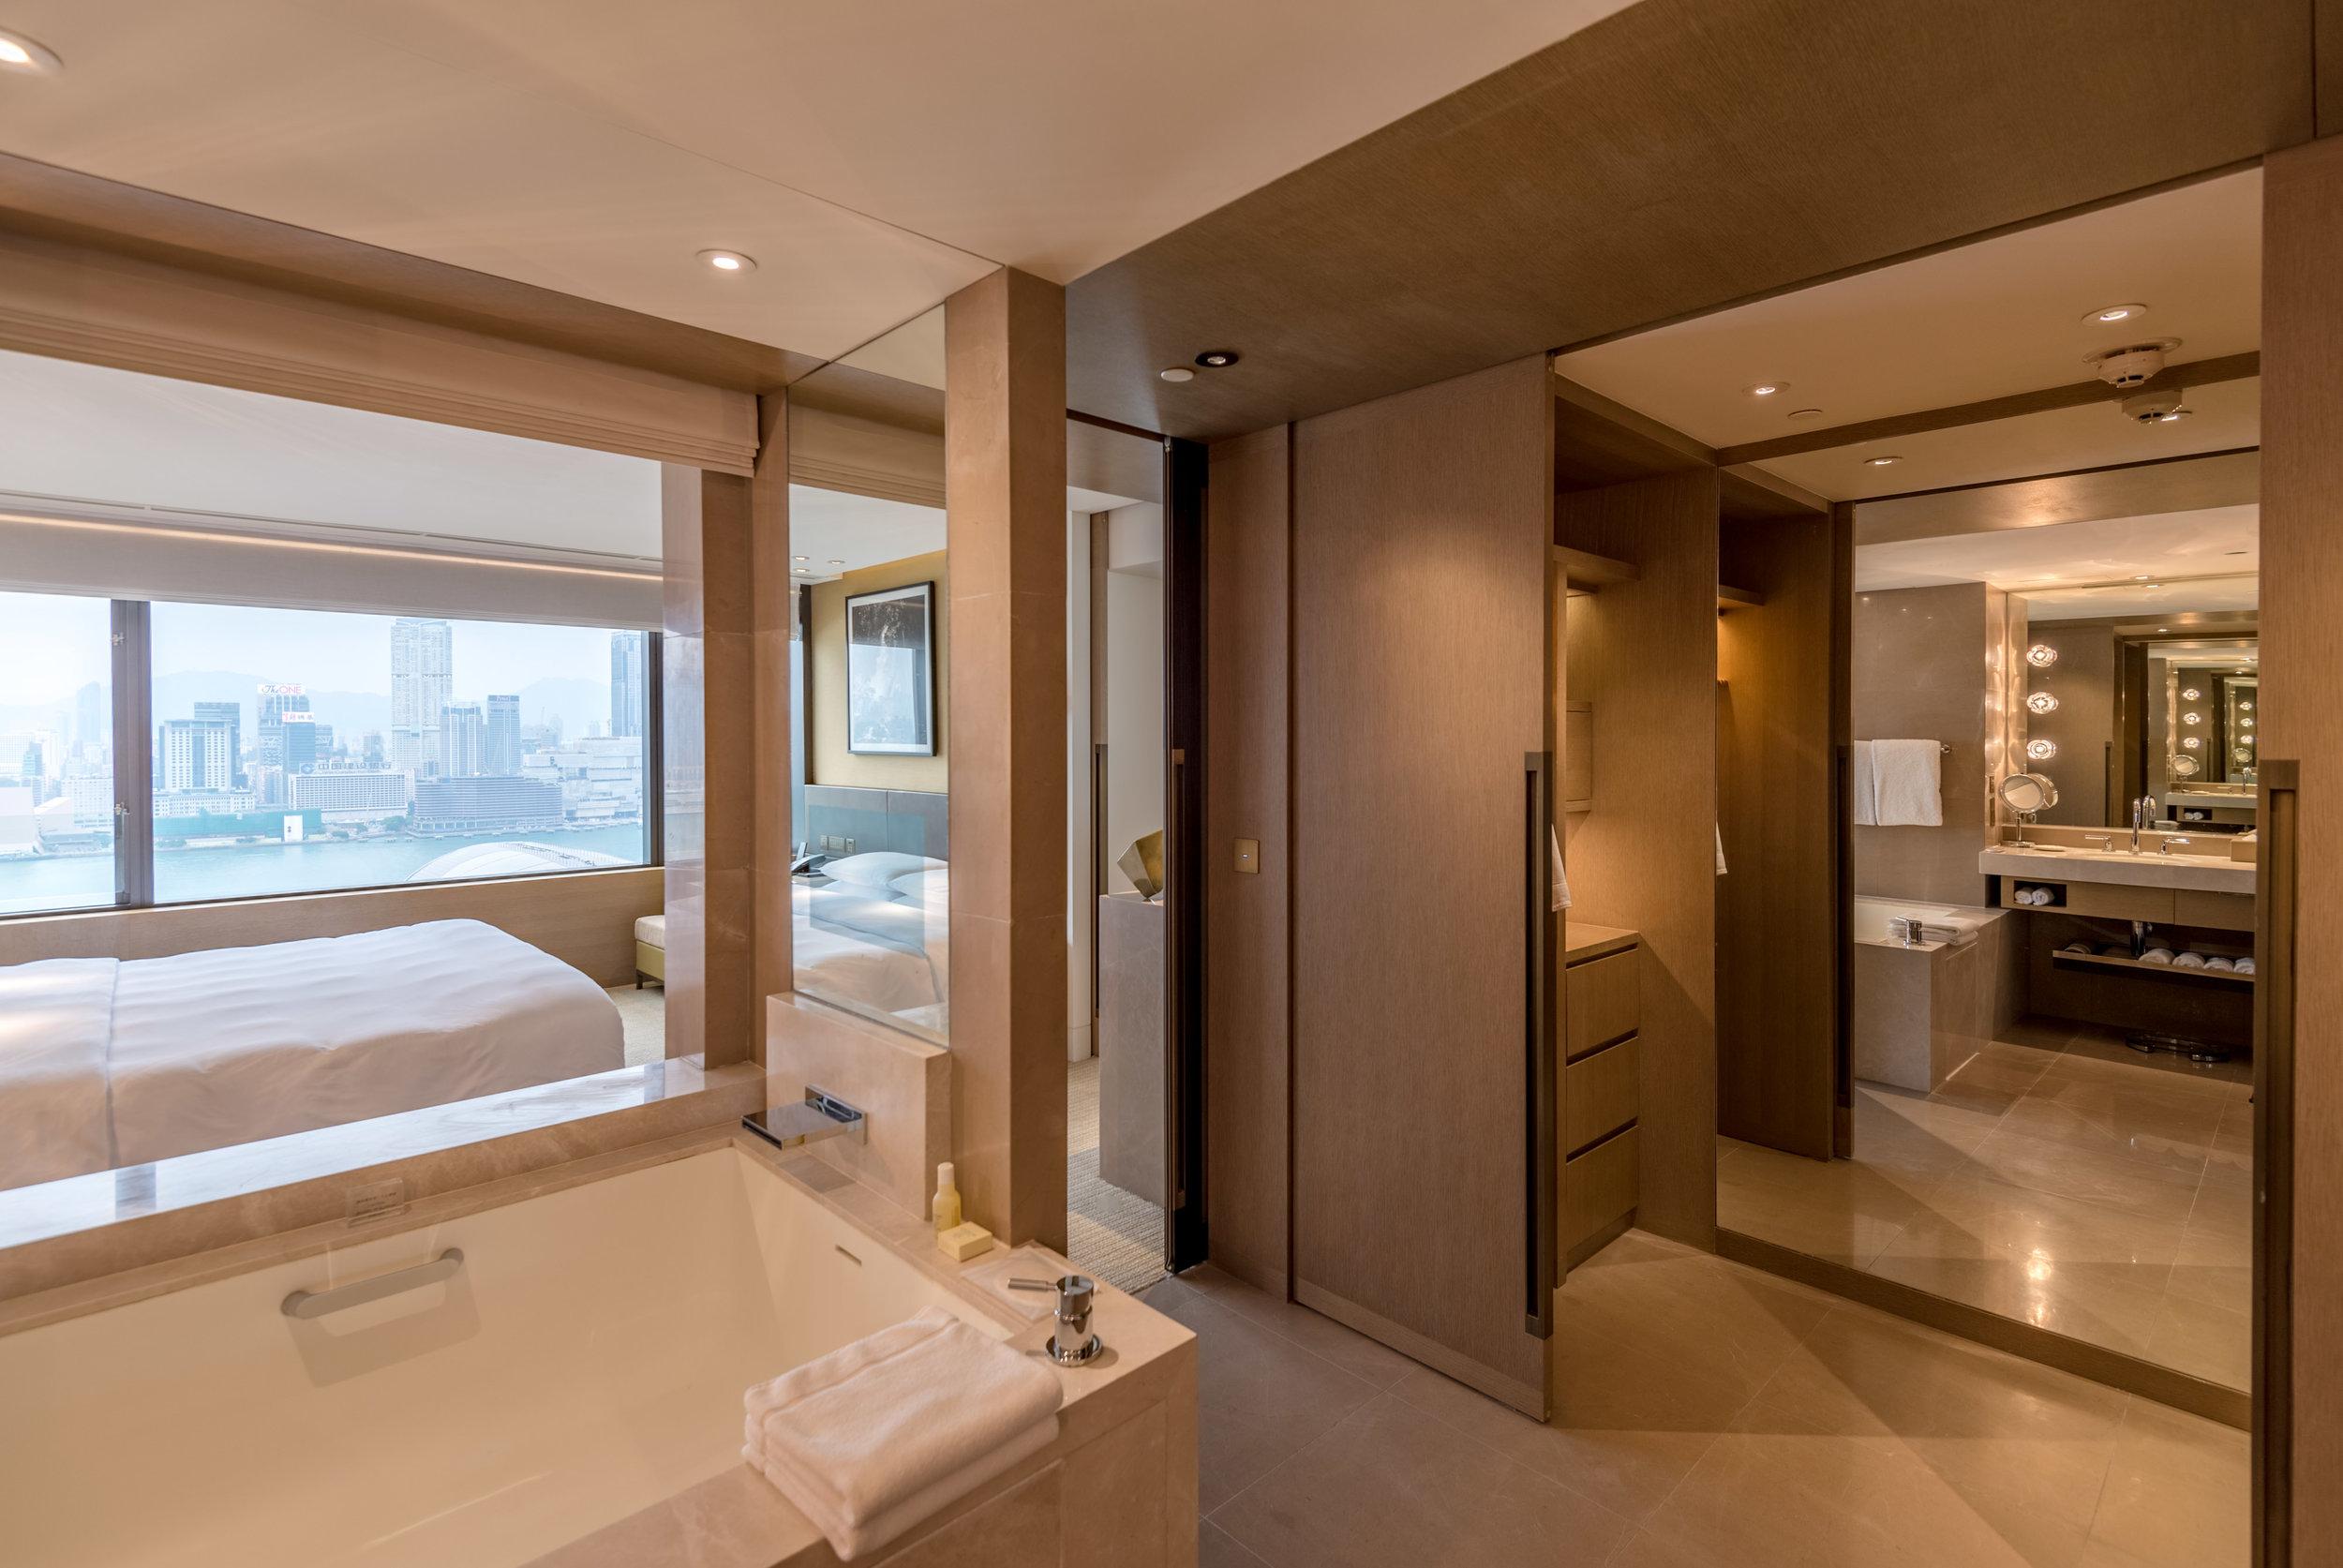 Bathroom with Walk-in Wardrobe  Victoria Harbour Suite - Grand Hyatt Hong Kong